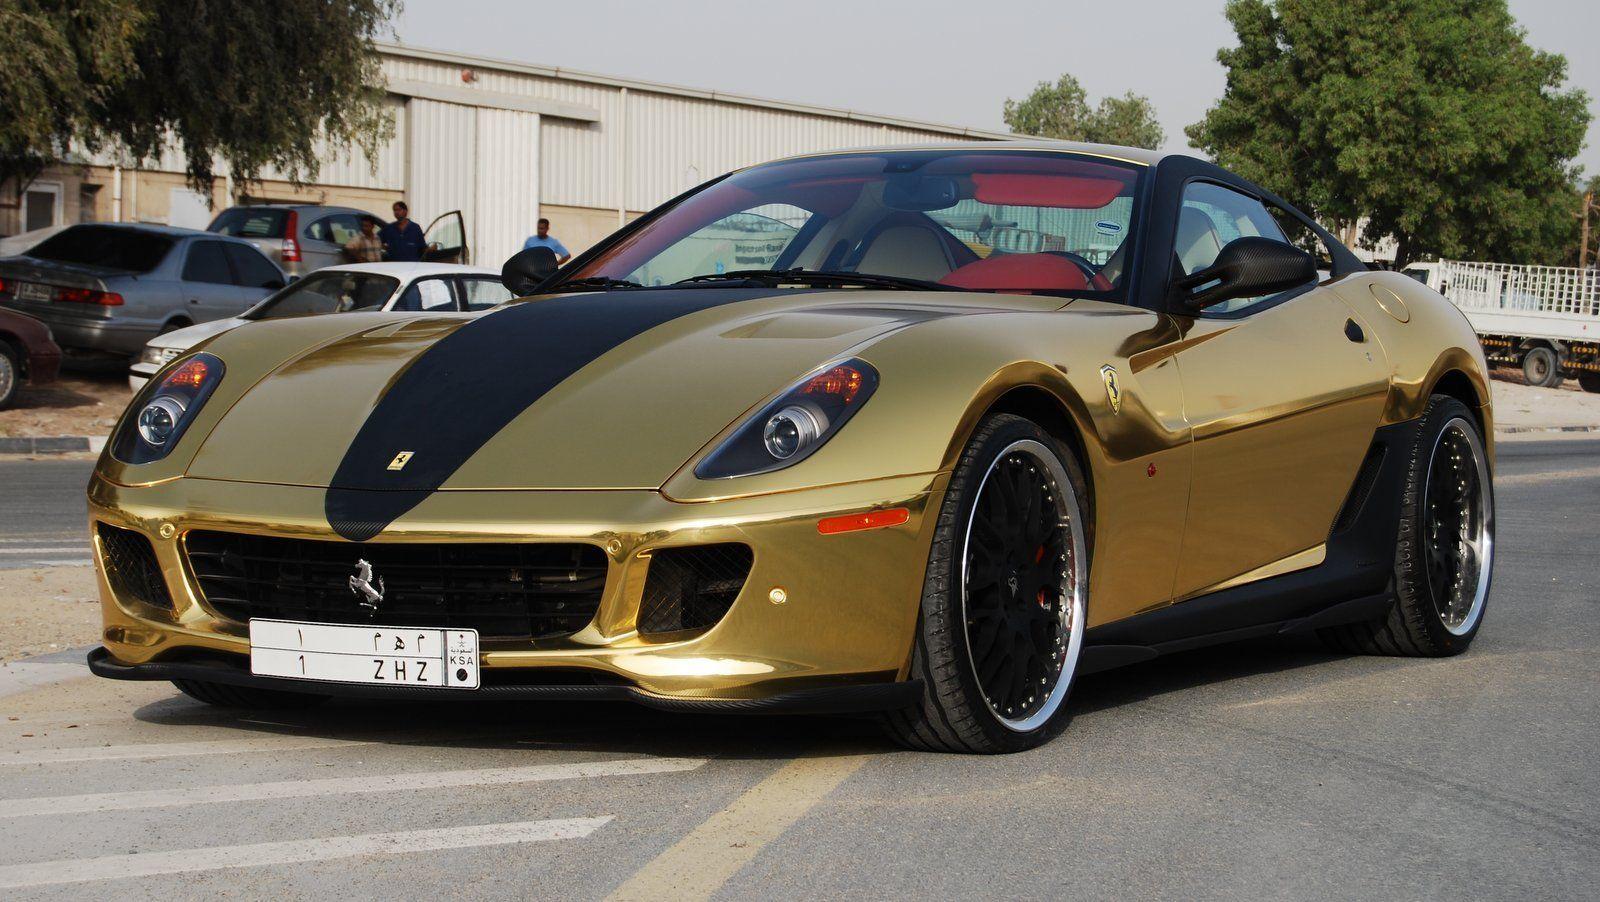 gold ferrari 599 gtb fiorano v12 612 hp 0 100 km h 62 mph in 3 7 seconds 0 200 km h 124 mph. Black Bedroom Furniture Sets. Home Design Ideas